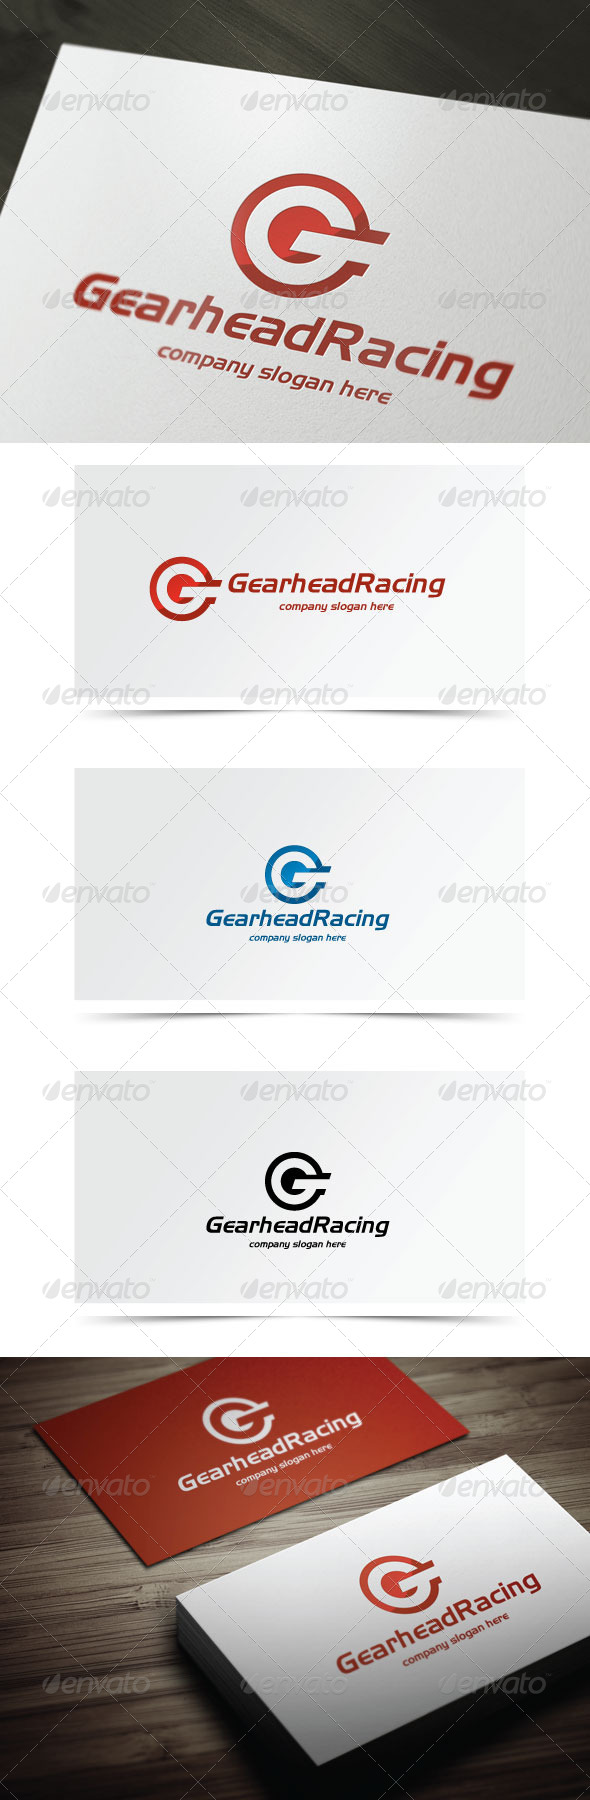 Gearhead Racing